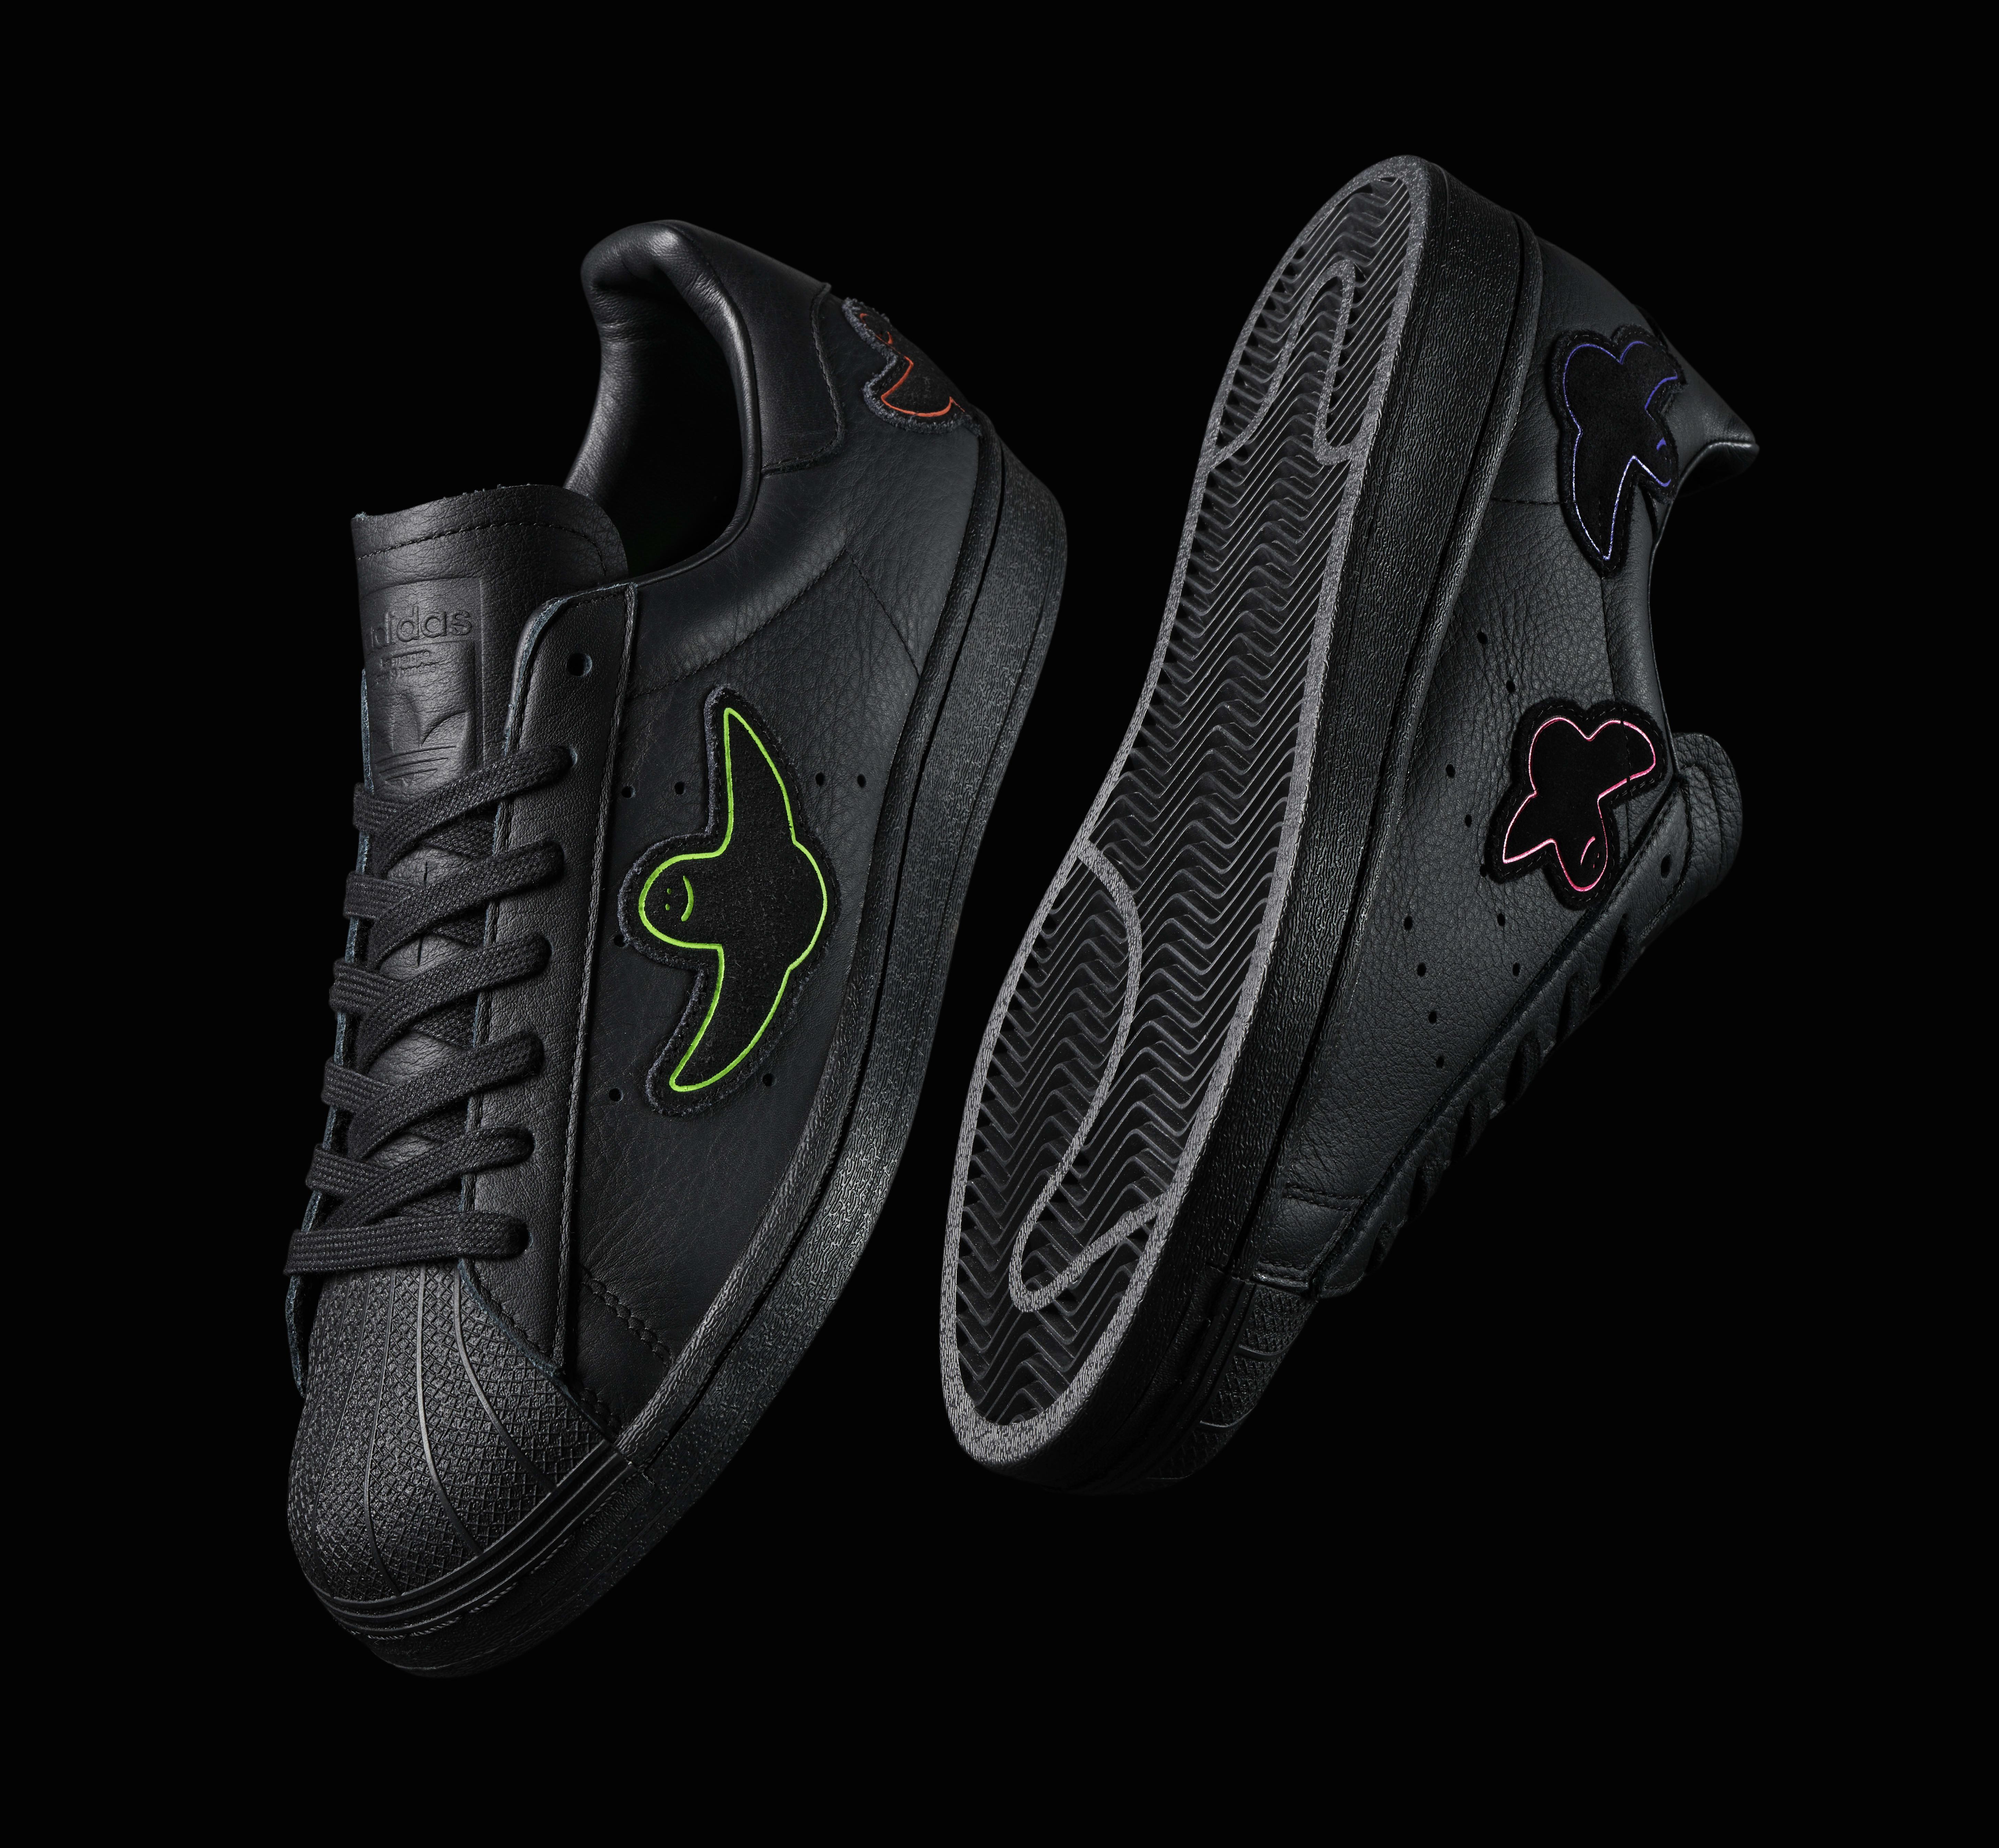 Mark Gonzales x Adidas Skateboarding Superstar 'Shmoo' Side